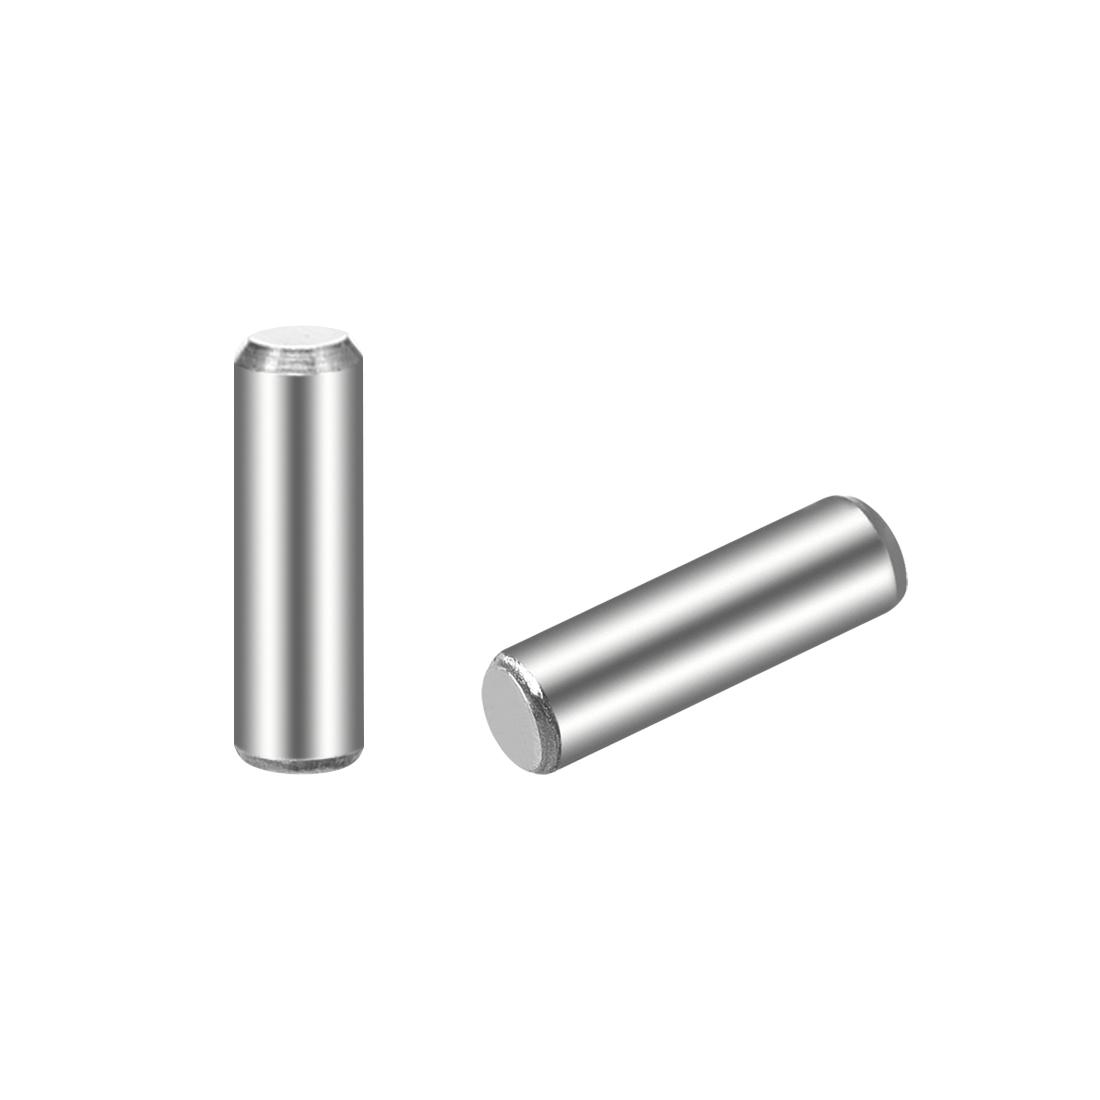 100Pcs 3mm x 10mm Dowel Pin 304 Stainless Steel Shelf Support Pin Fasten